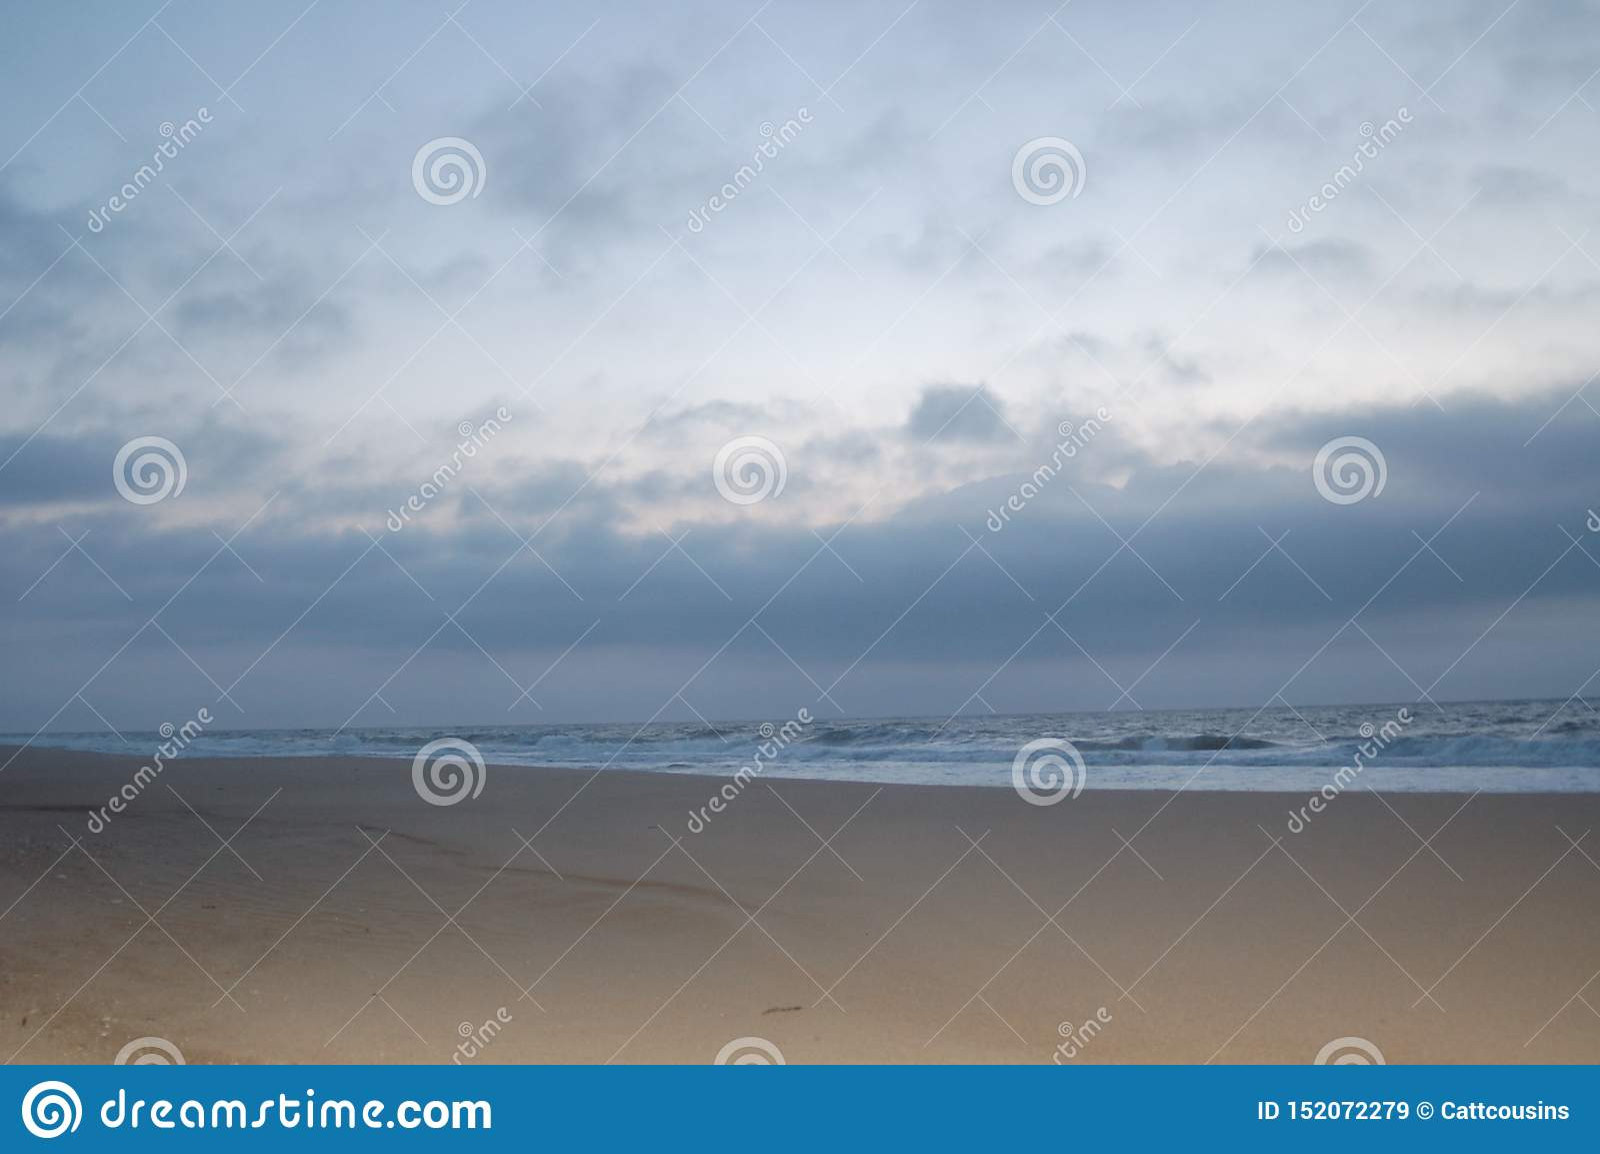 Sunrise on the ocean, white sky, and sand